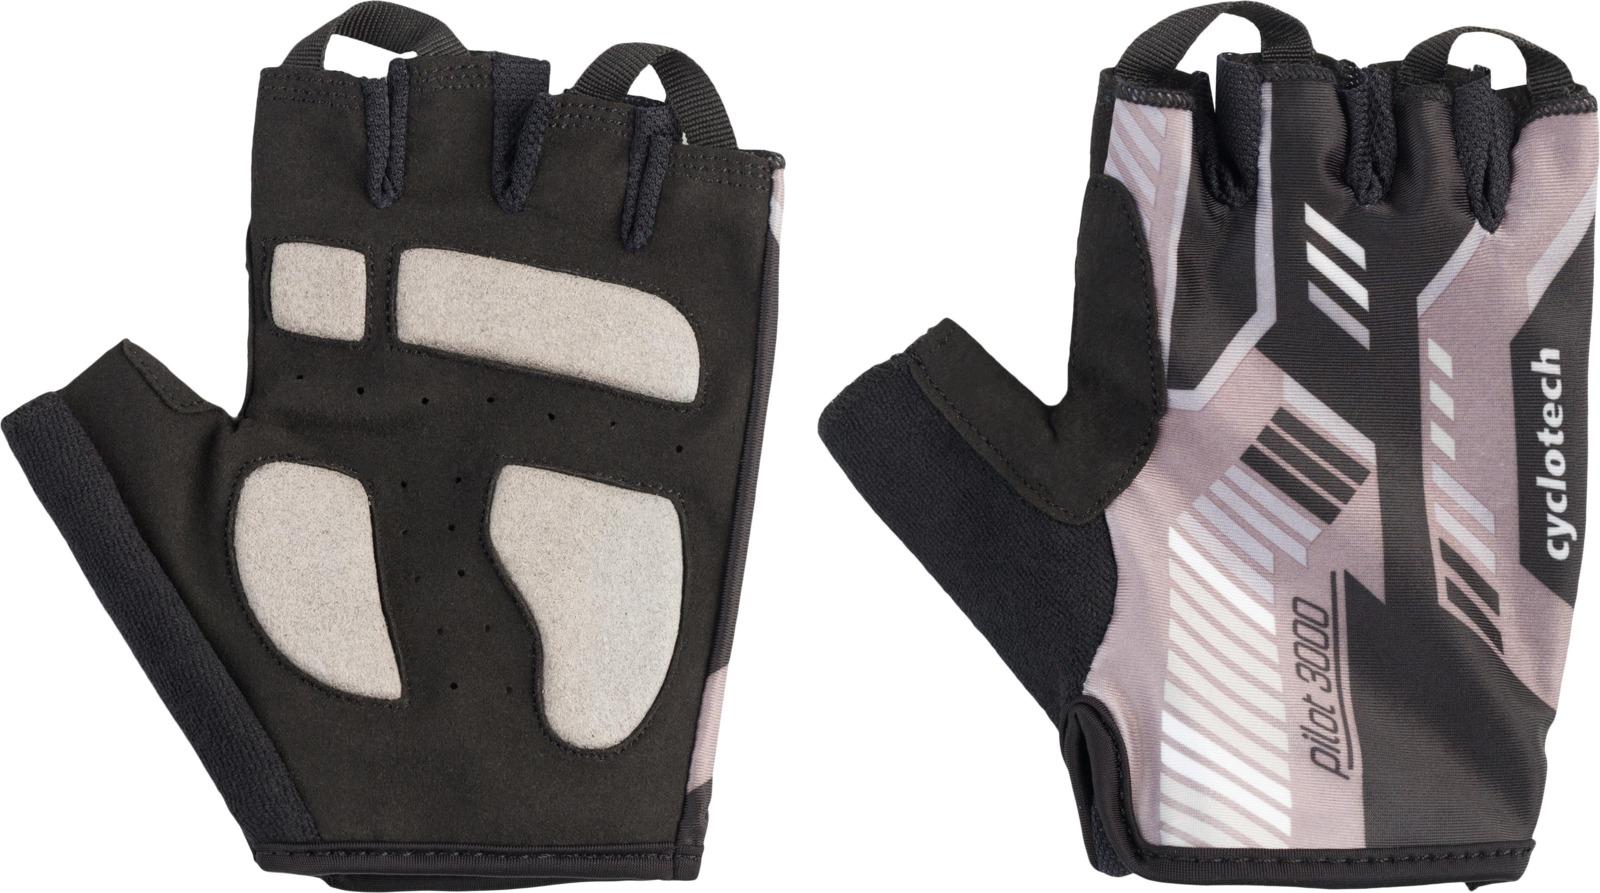 Велоперчатки Cyclotech PILOT Bike gloves, черный, серый, размер L цена